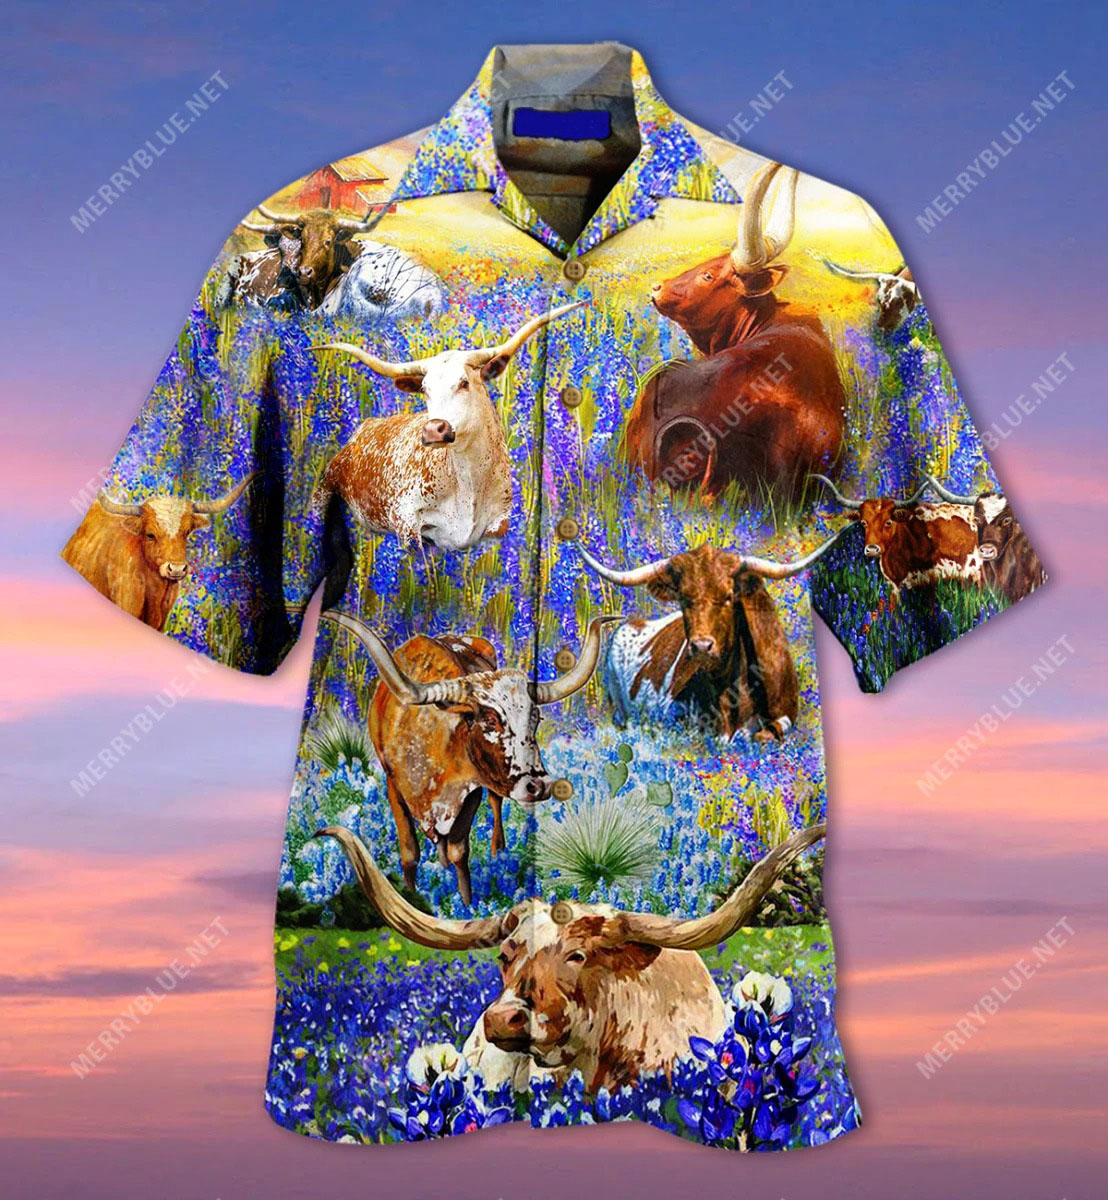 Texas longhorn in bluebonnets unisex hawaiian shirt front